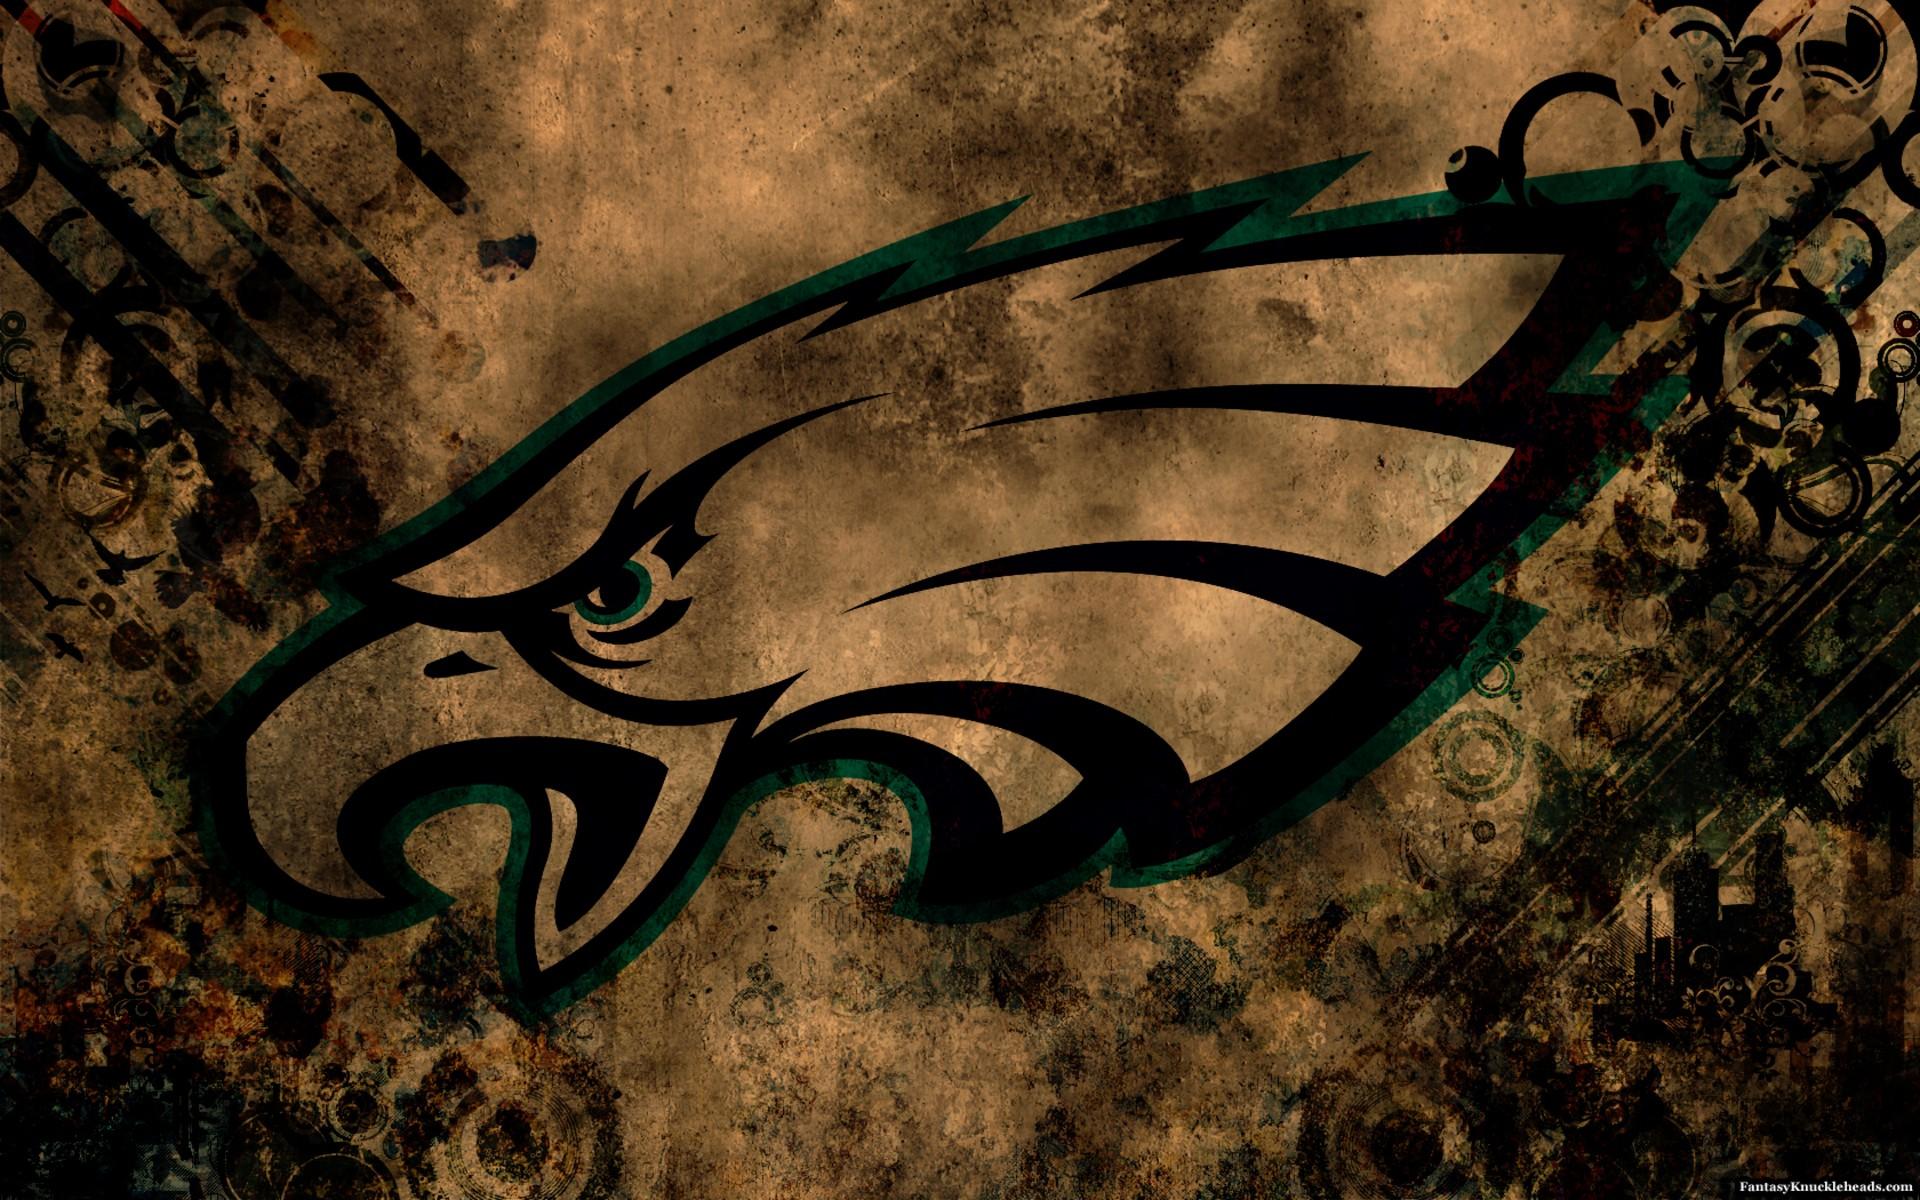 Iphone X Philadelphia Eagles Wallpaper Philadelphia Eagles Wallpaper 183 ① Download Free Amazing Hd